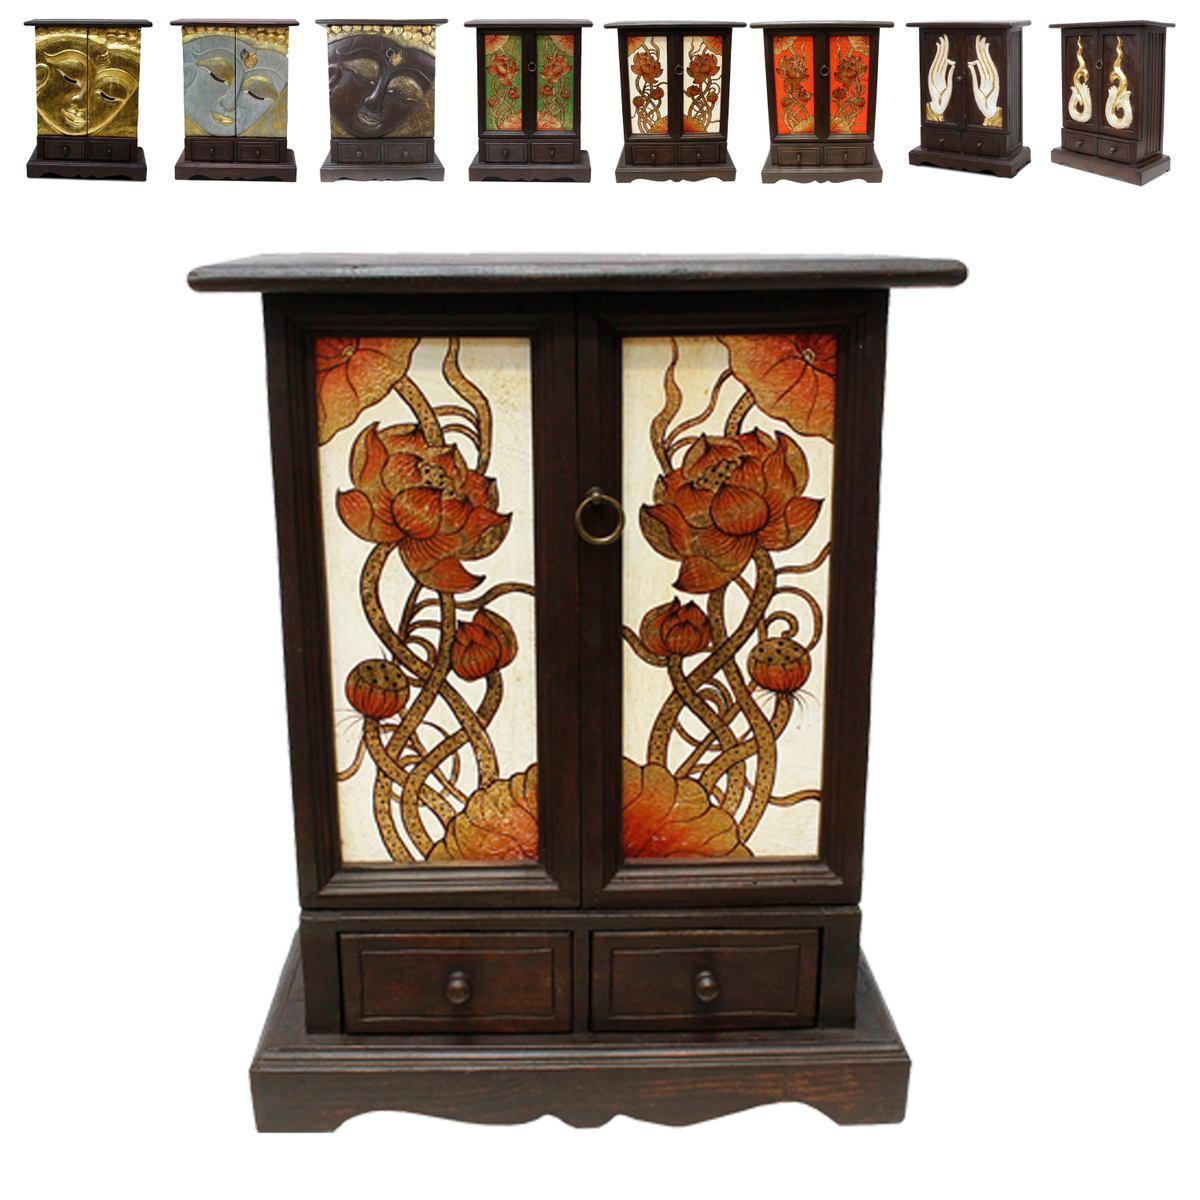 flurschrank wandschrank kommode schubladenschrank holzschrank schrank ca 70 cm hoch akazienholz. Black Bedroom Furniture Sets. Home Design Ideas